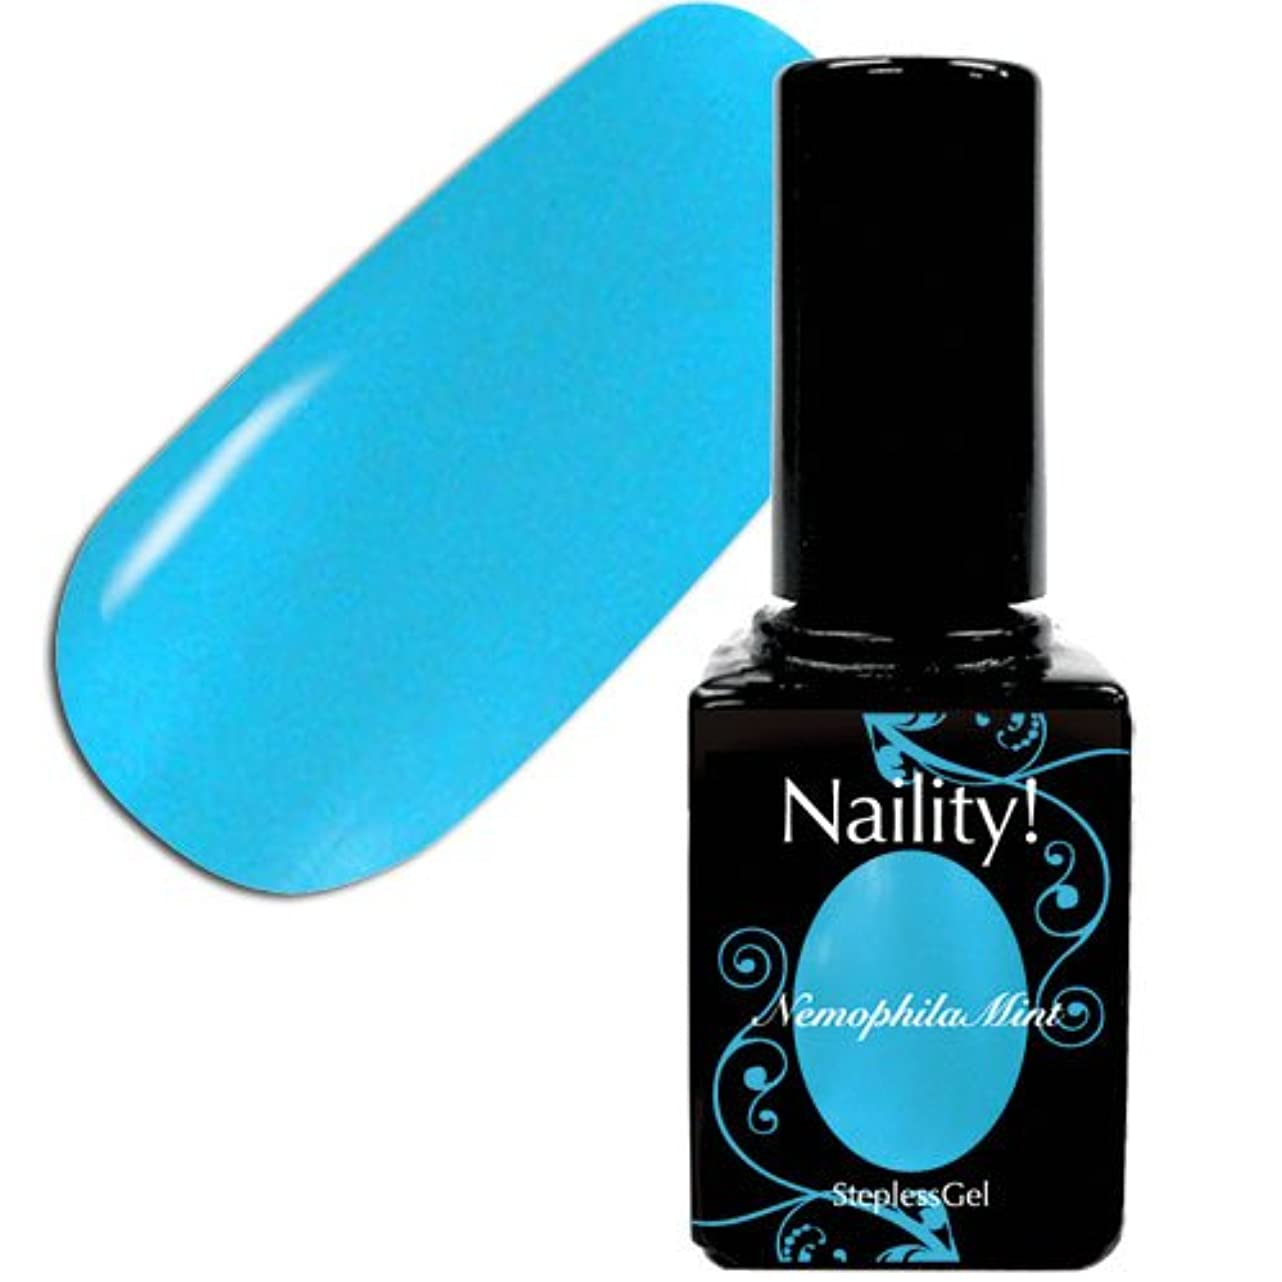 Naility! ステップレスジェル 132 ネモフィラミント 7g